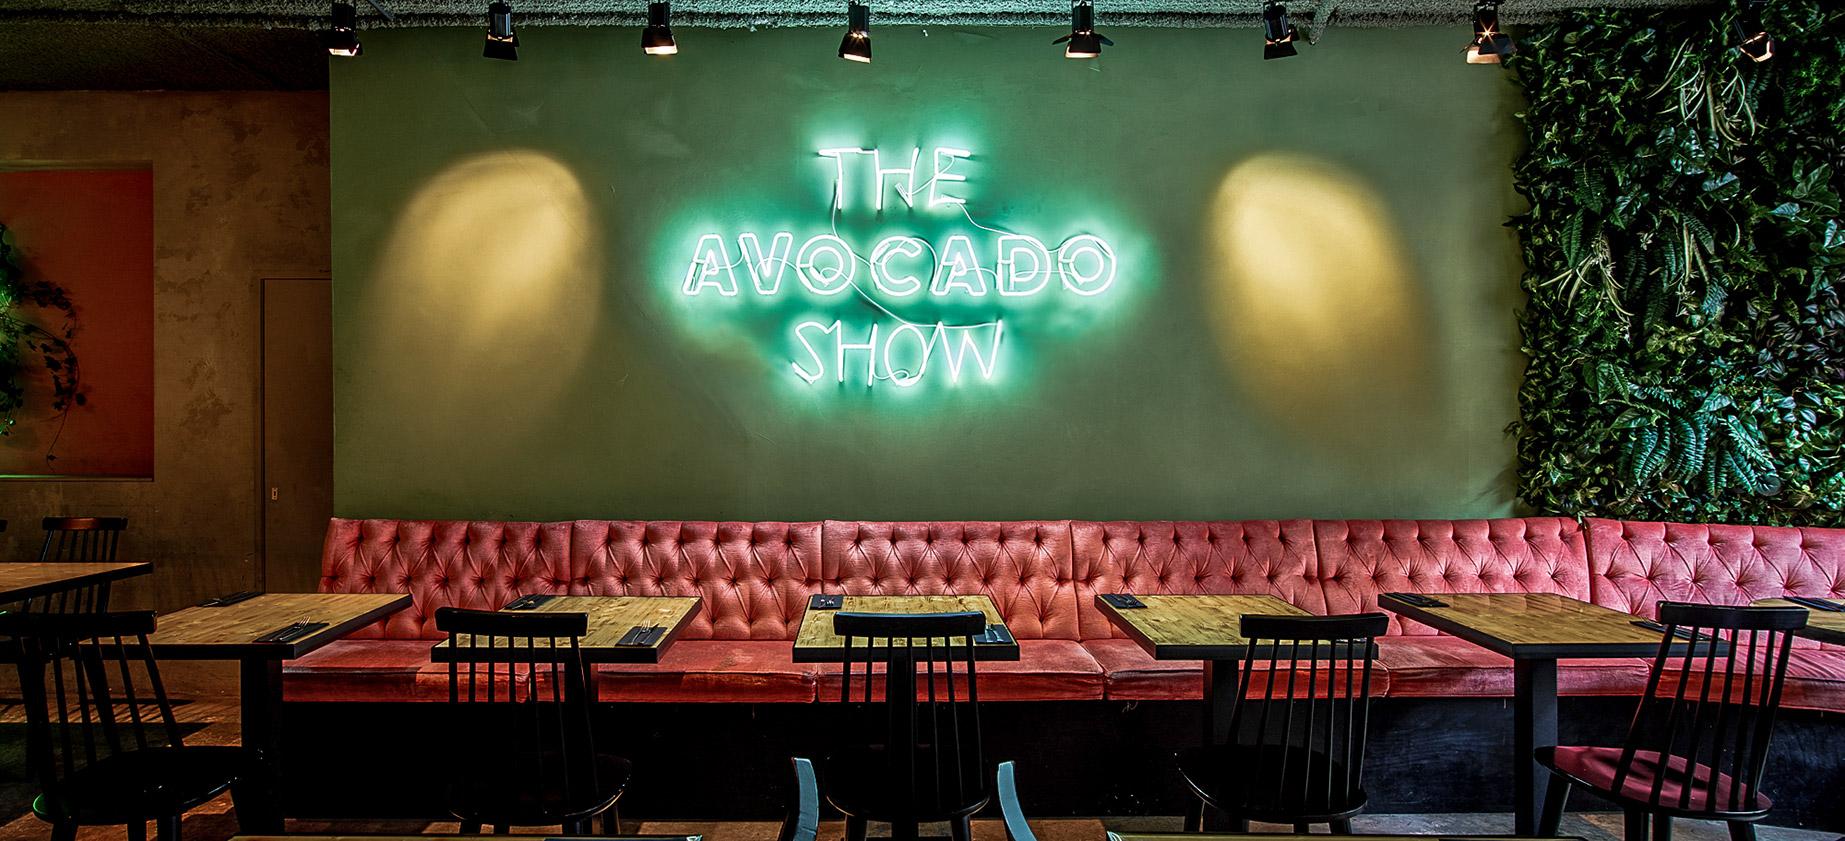 The Avocado Shop